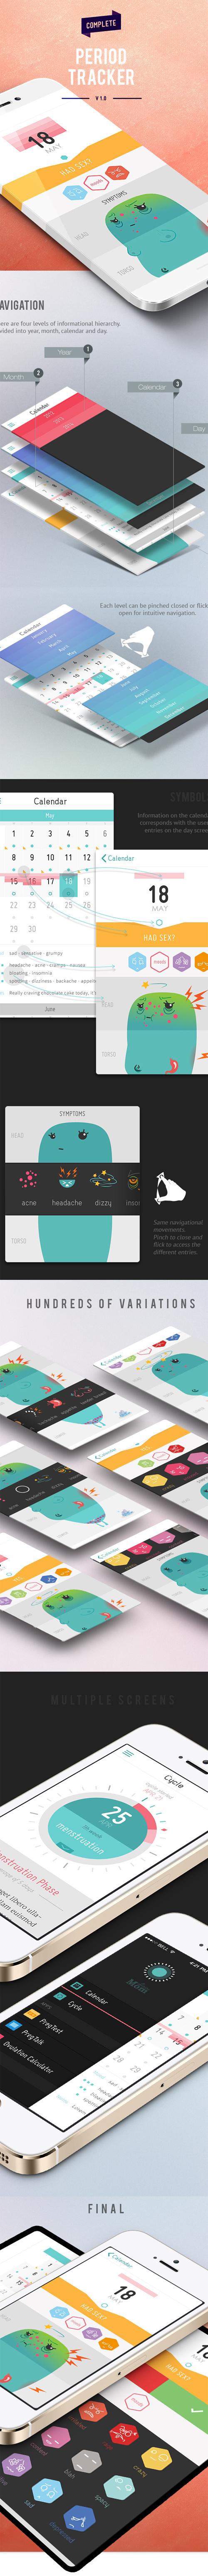 Amazing Mobile App UI Designs with Ultimate User Experience - 12 #ux #design #ui #iphone #app